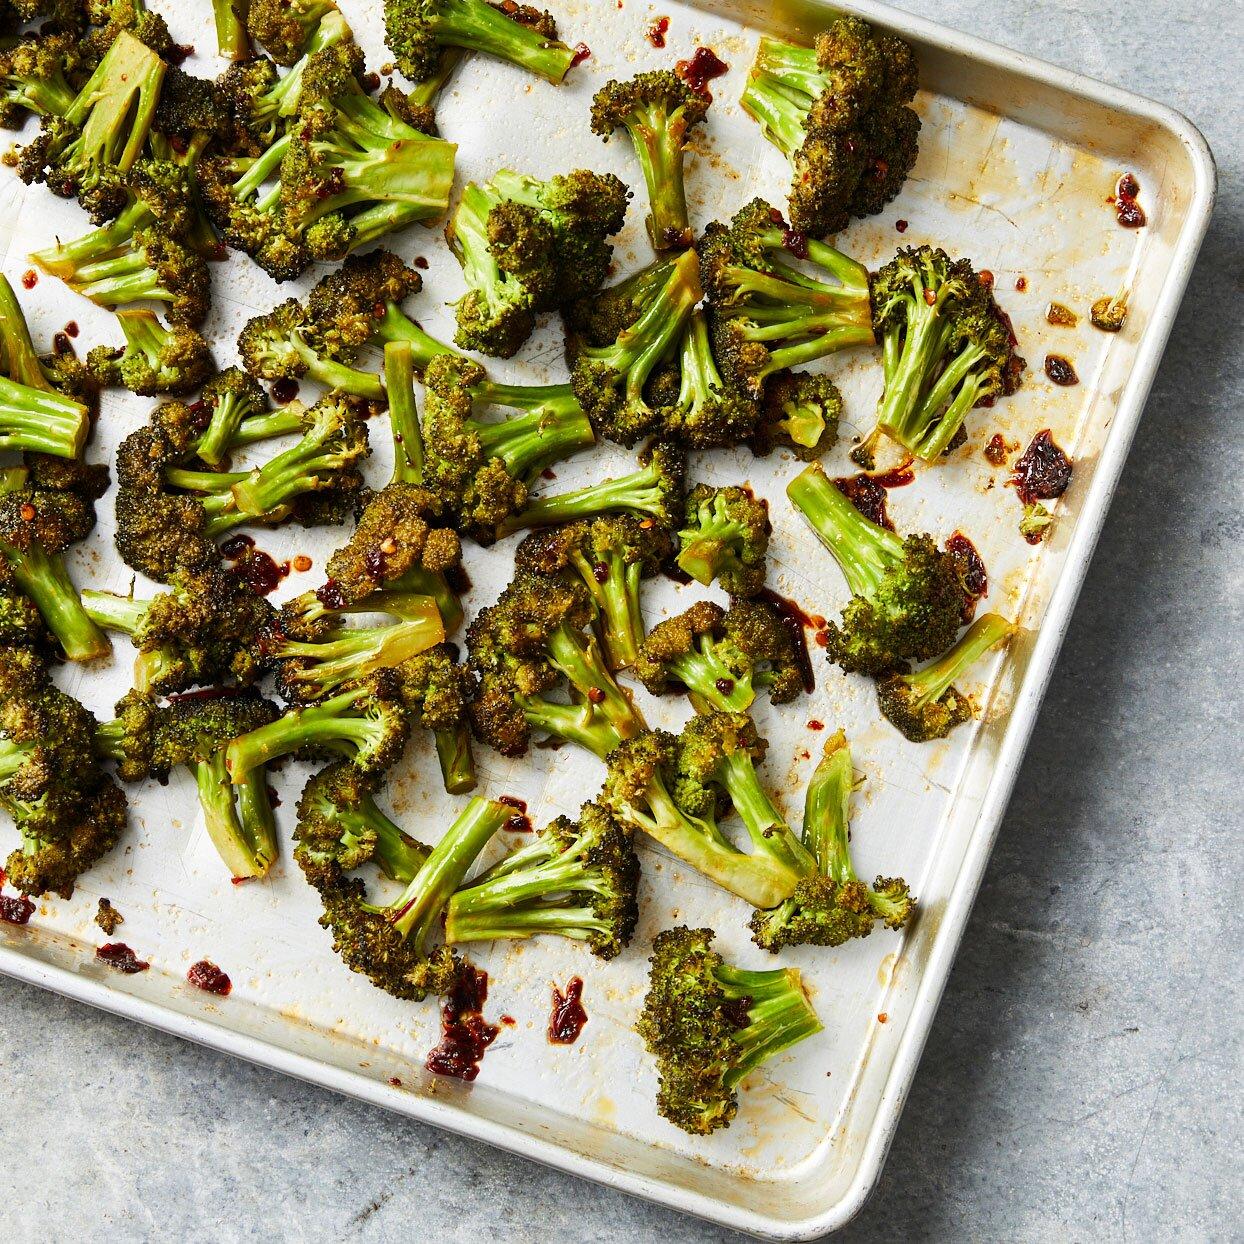 Honey-Chipotle Roasted Broccoli